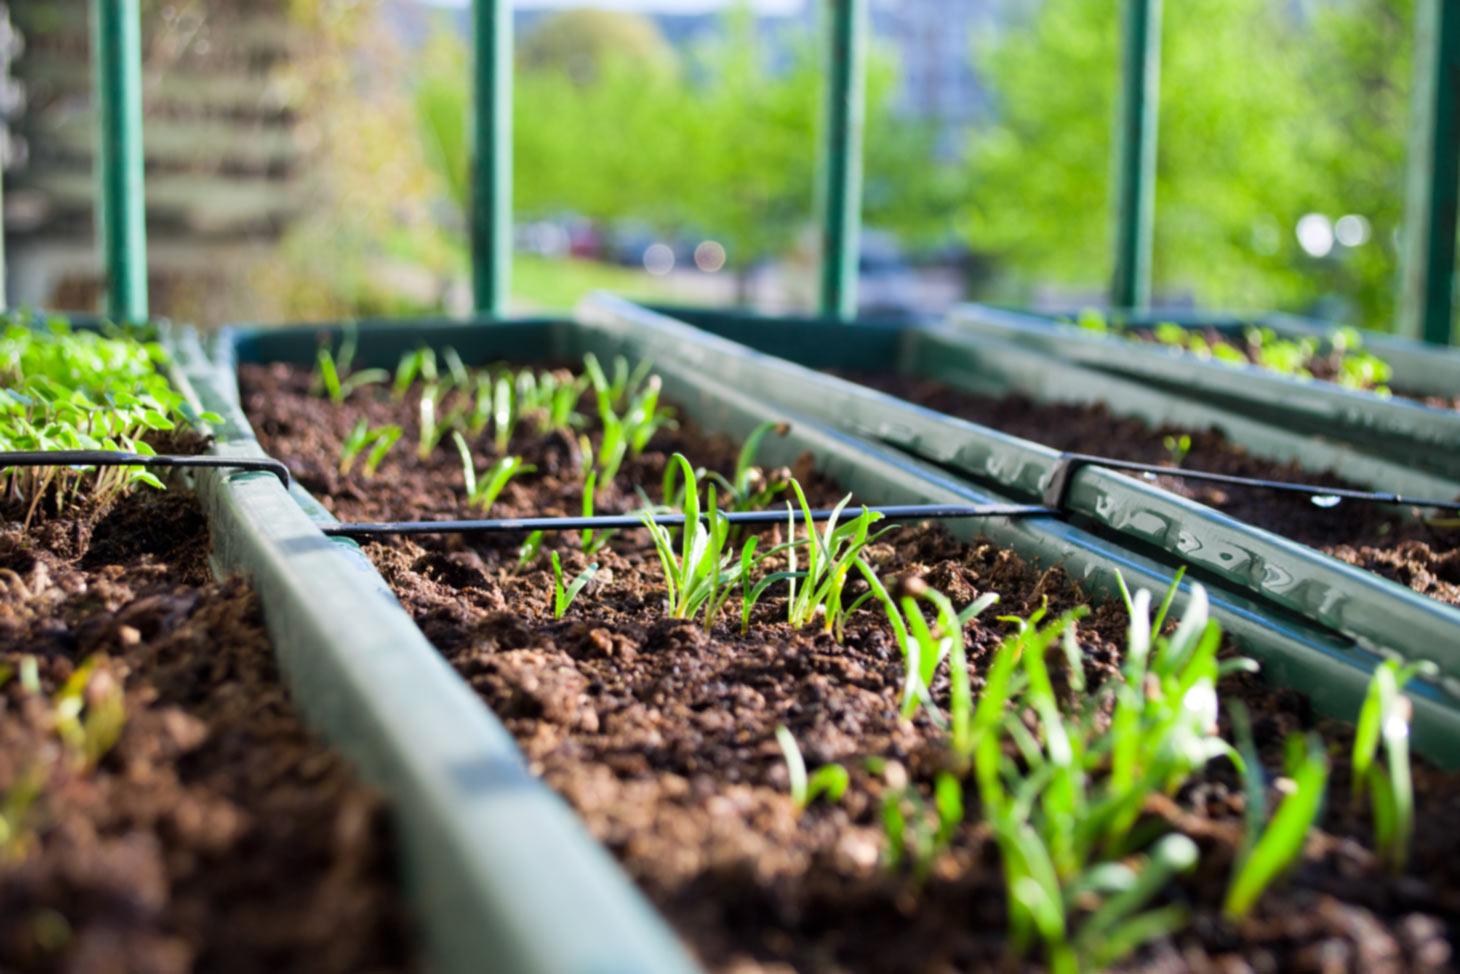 Aussaatschalen mit jungen Pflanzensämlingen